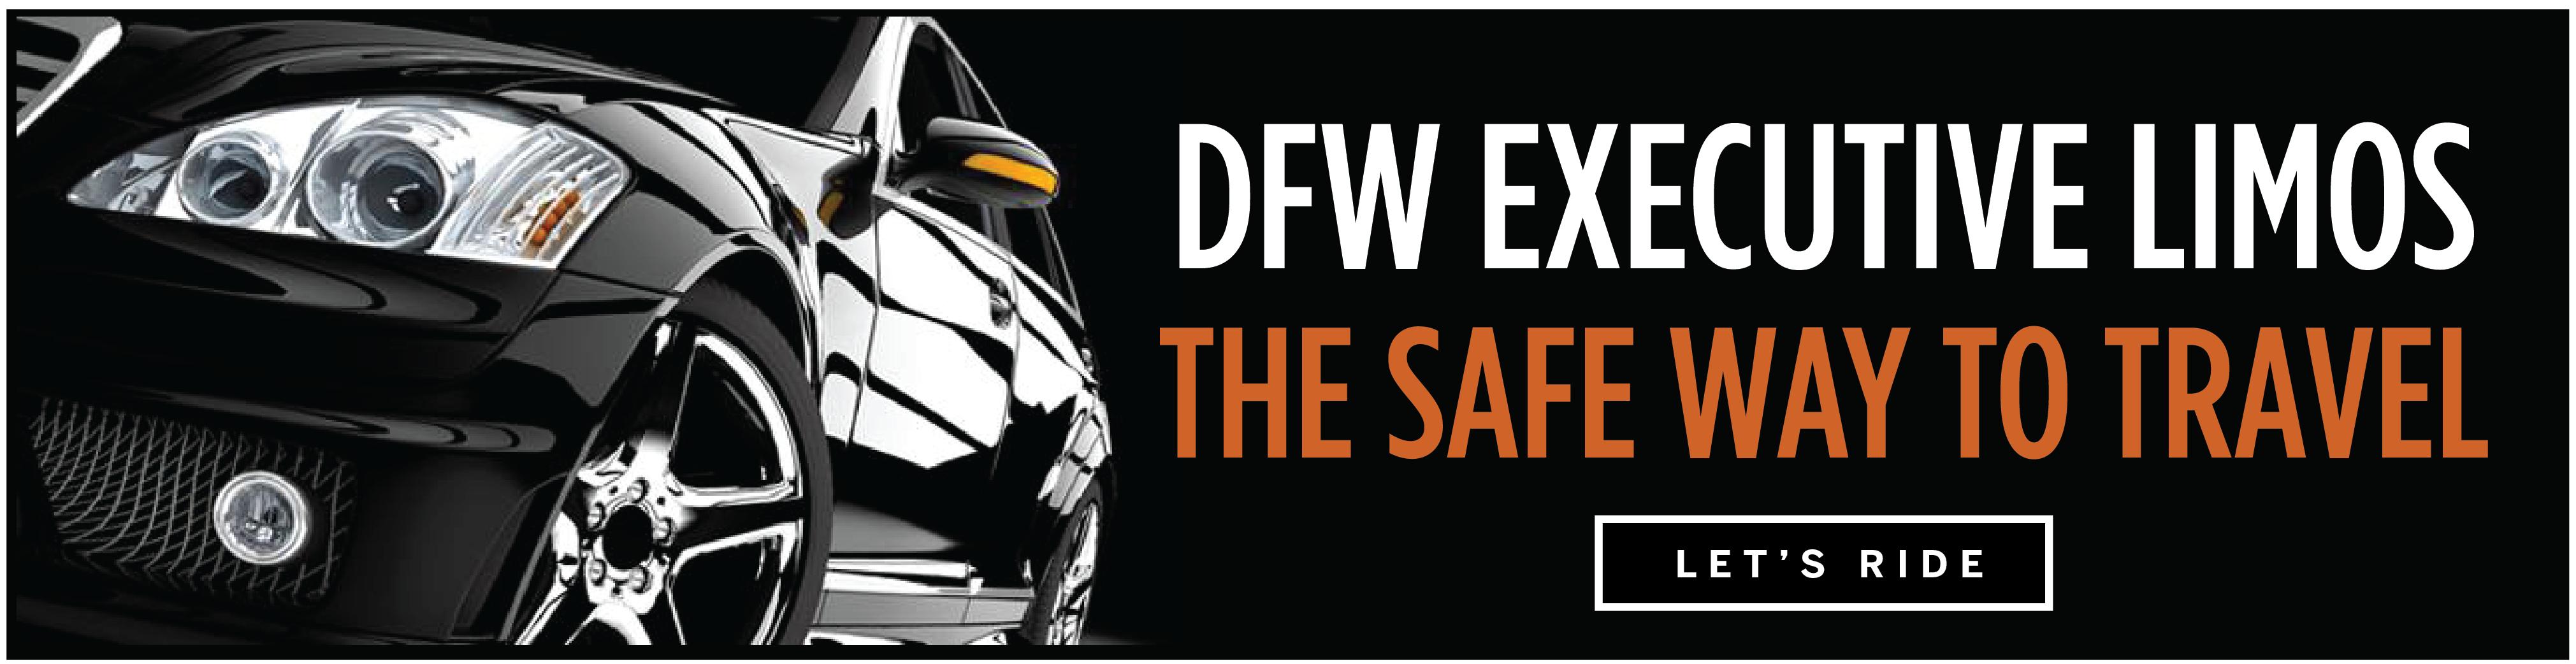 dfw car service